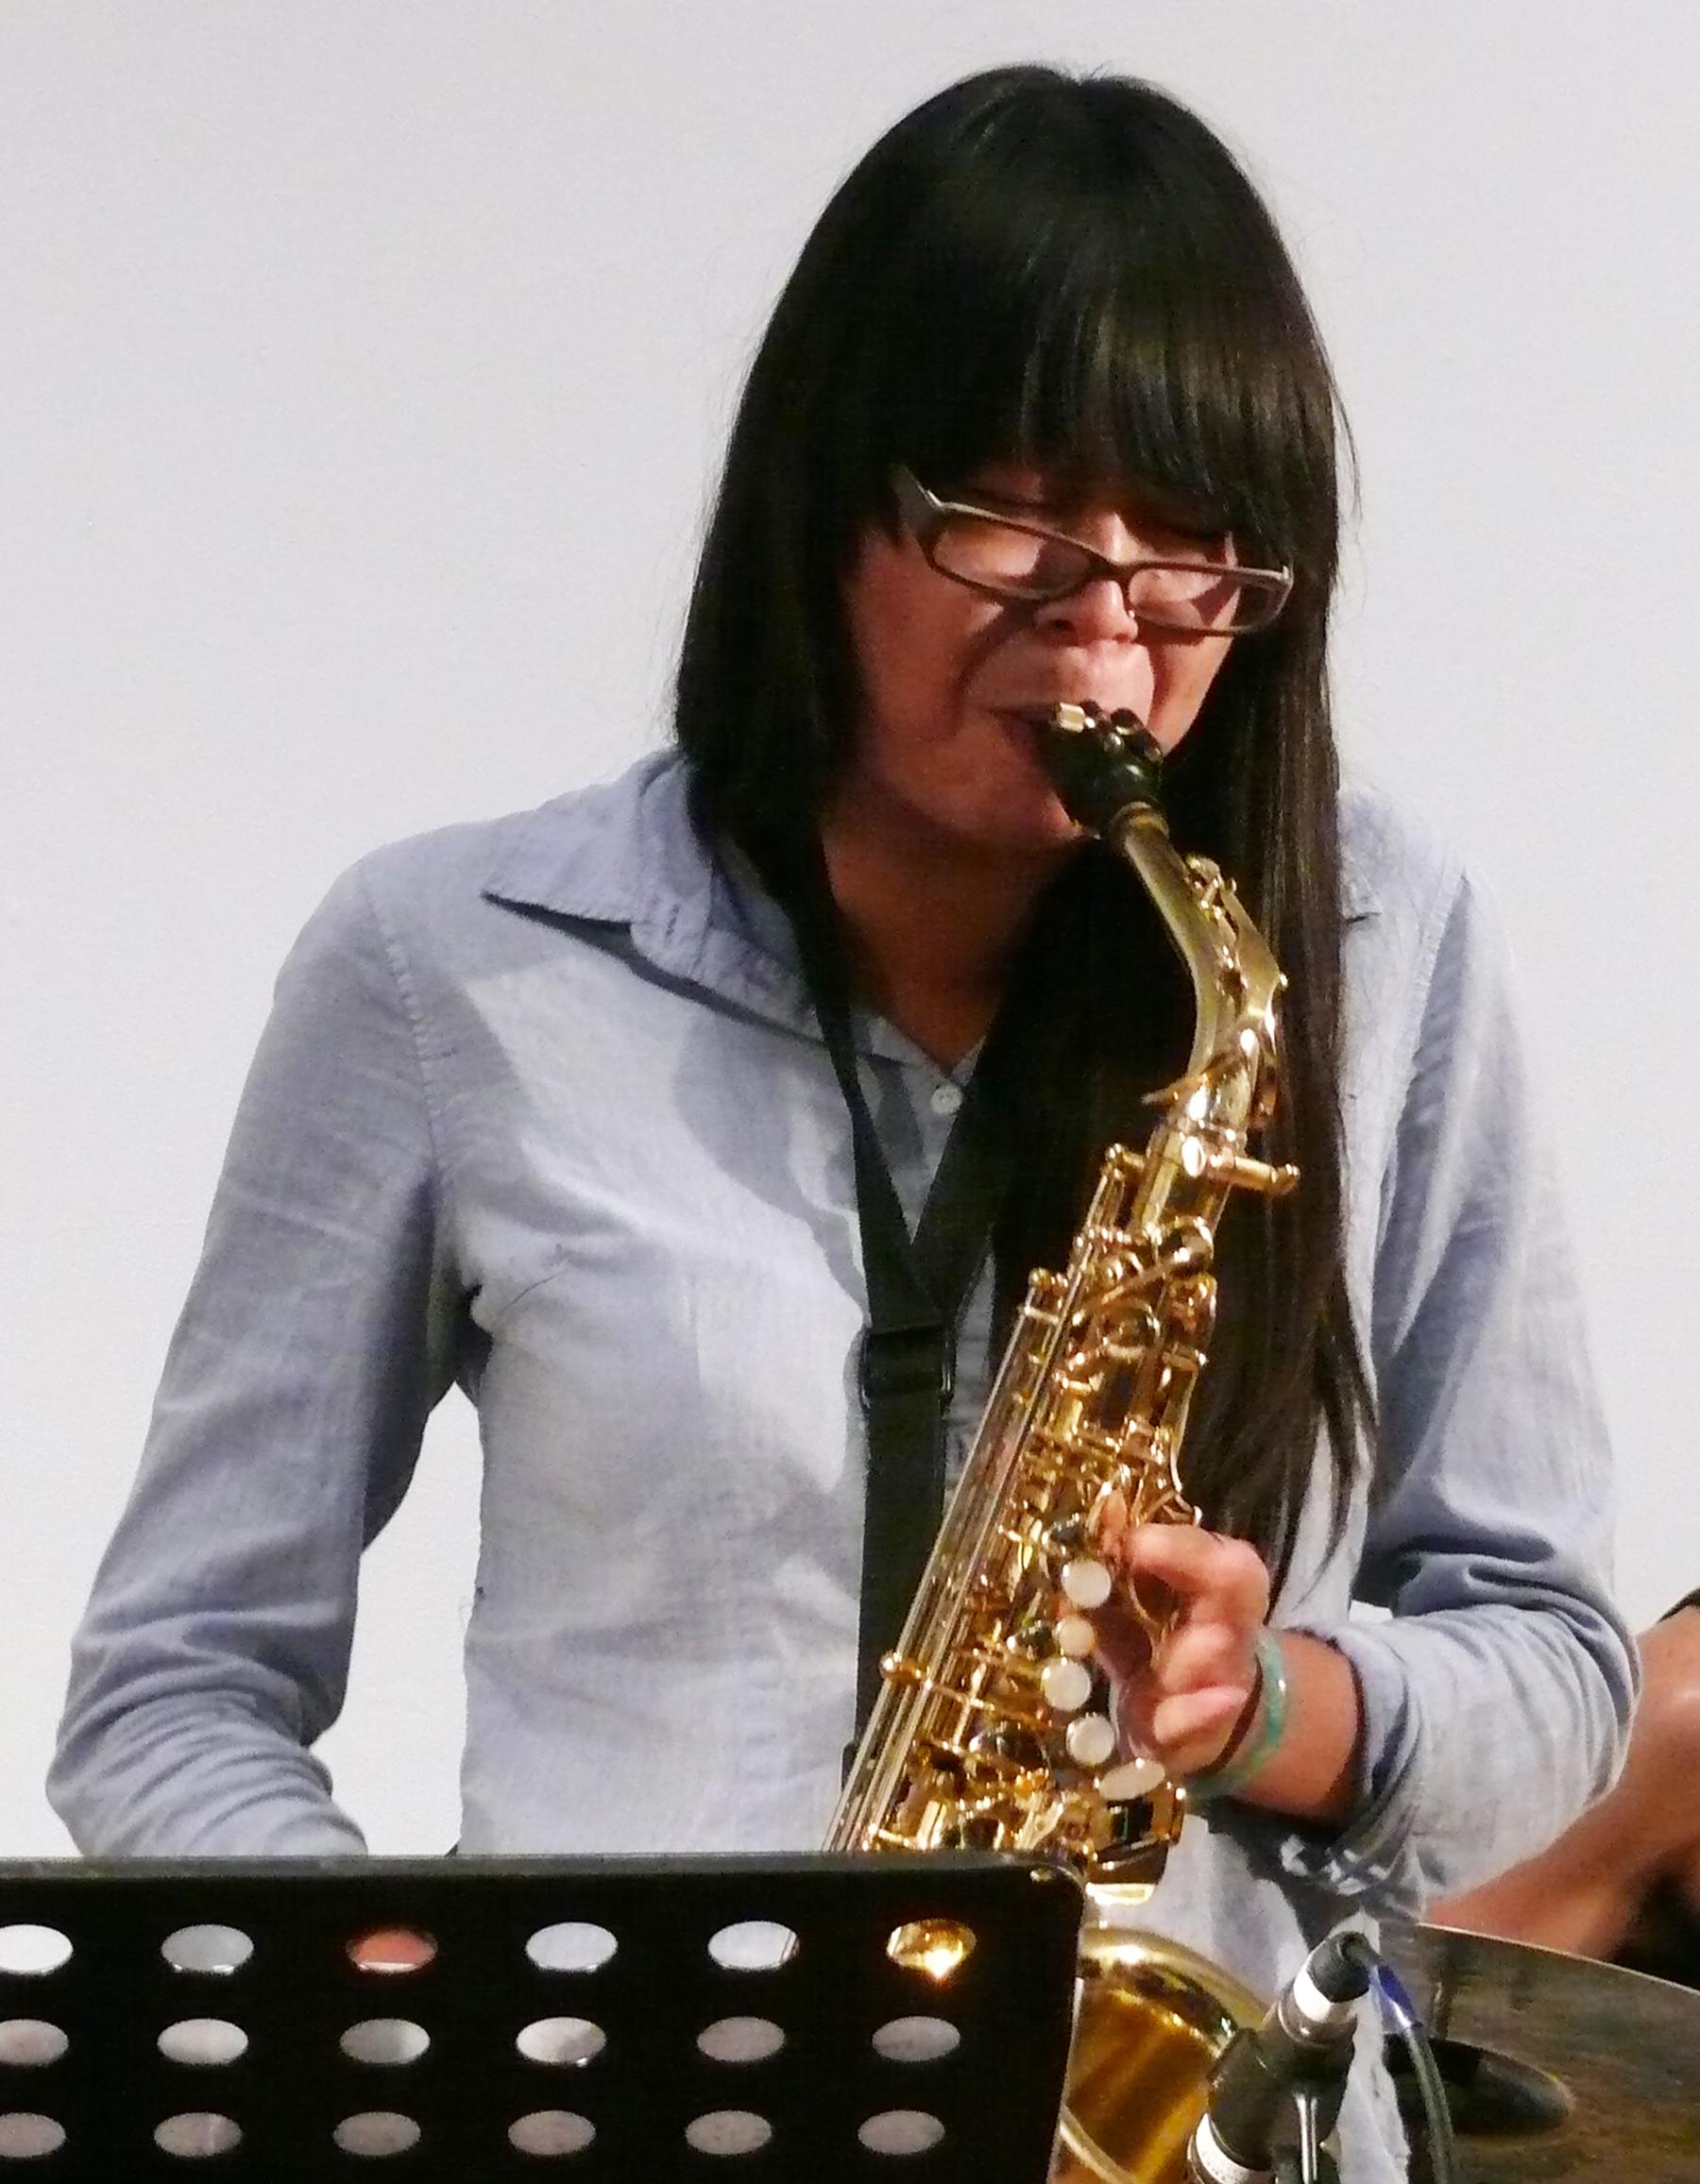 Karen NG at Guelph 2012